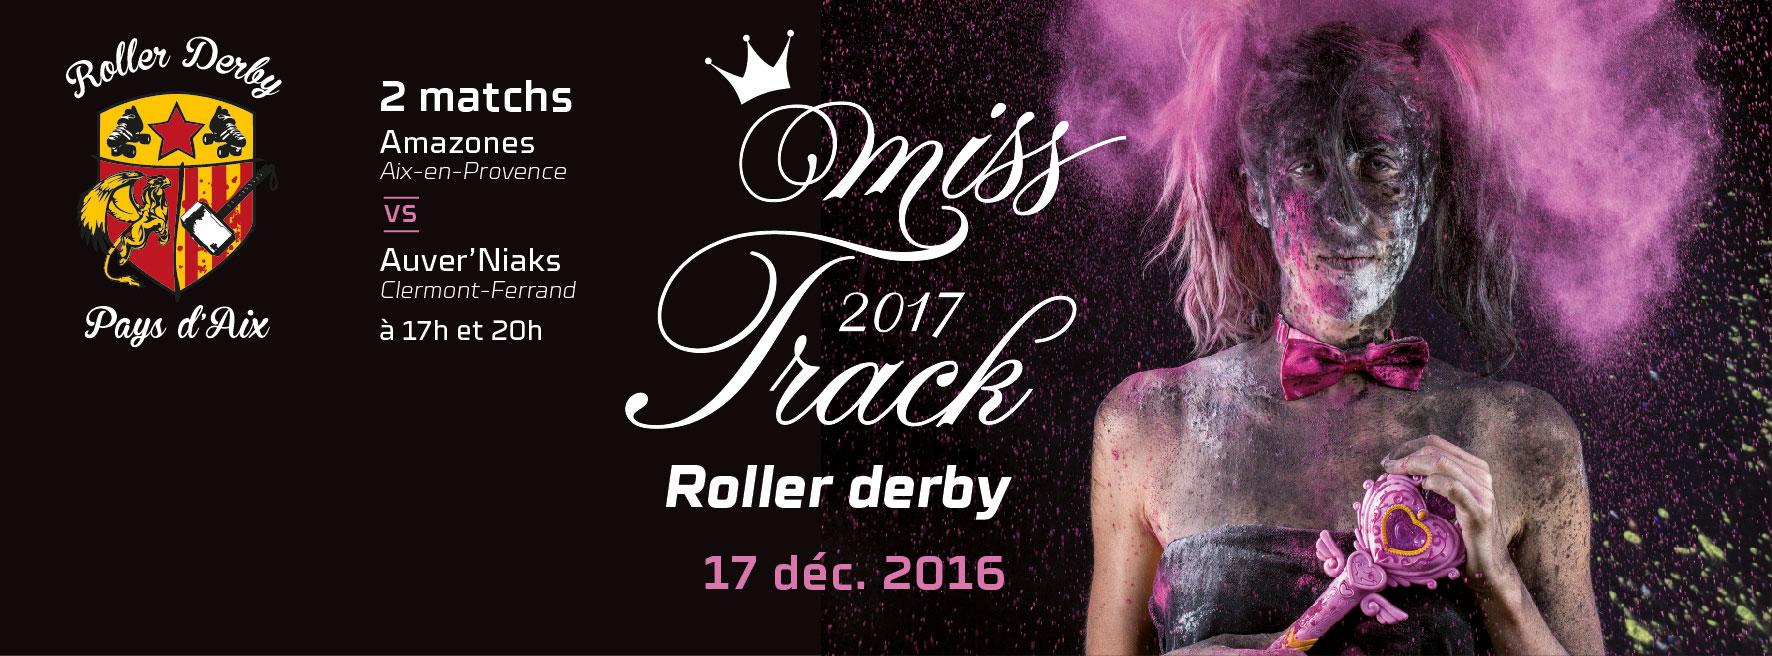 Miss Track 2017